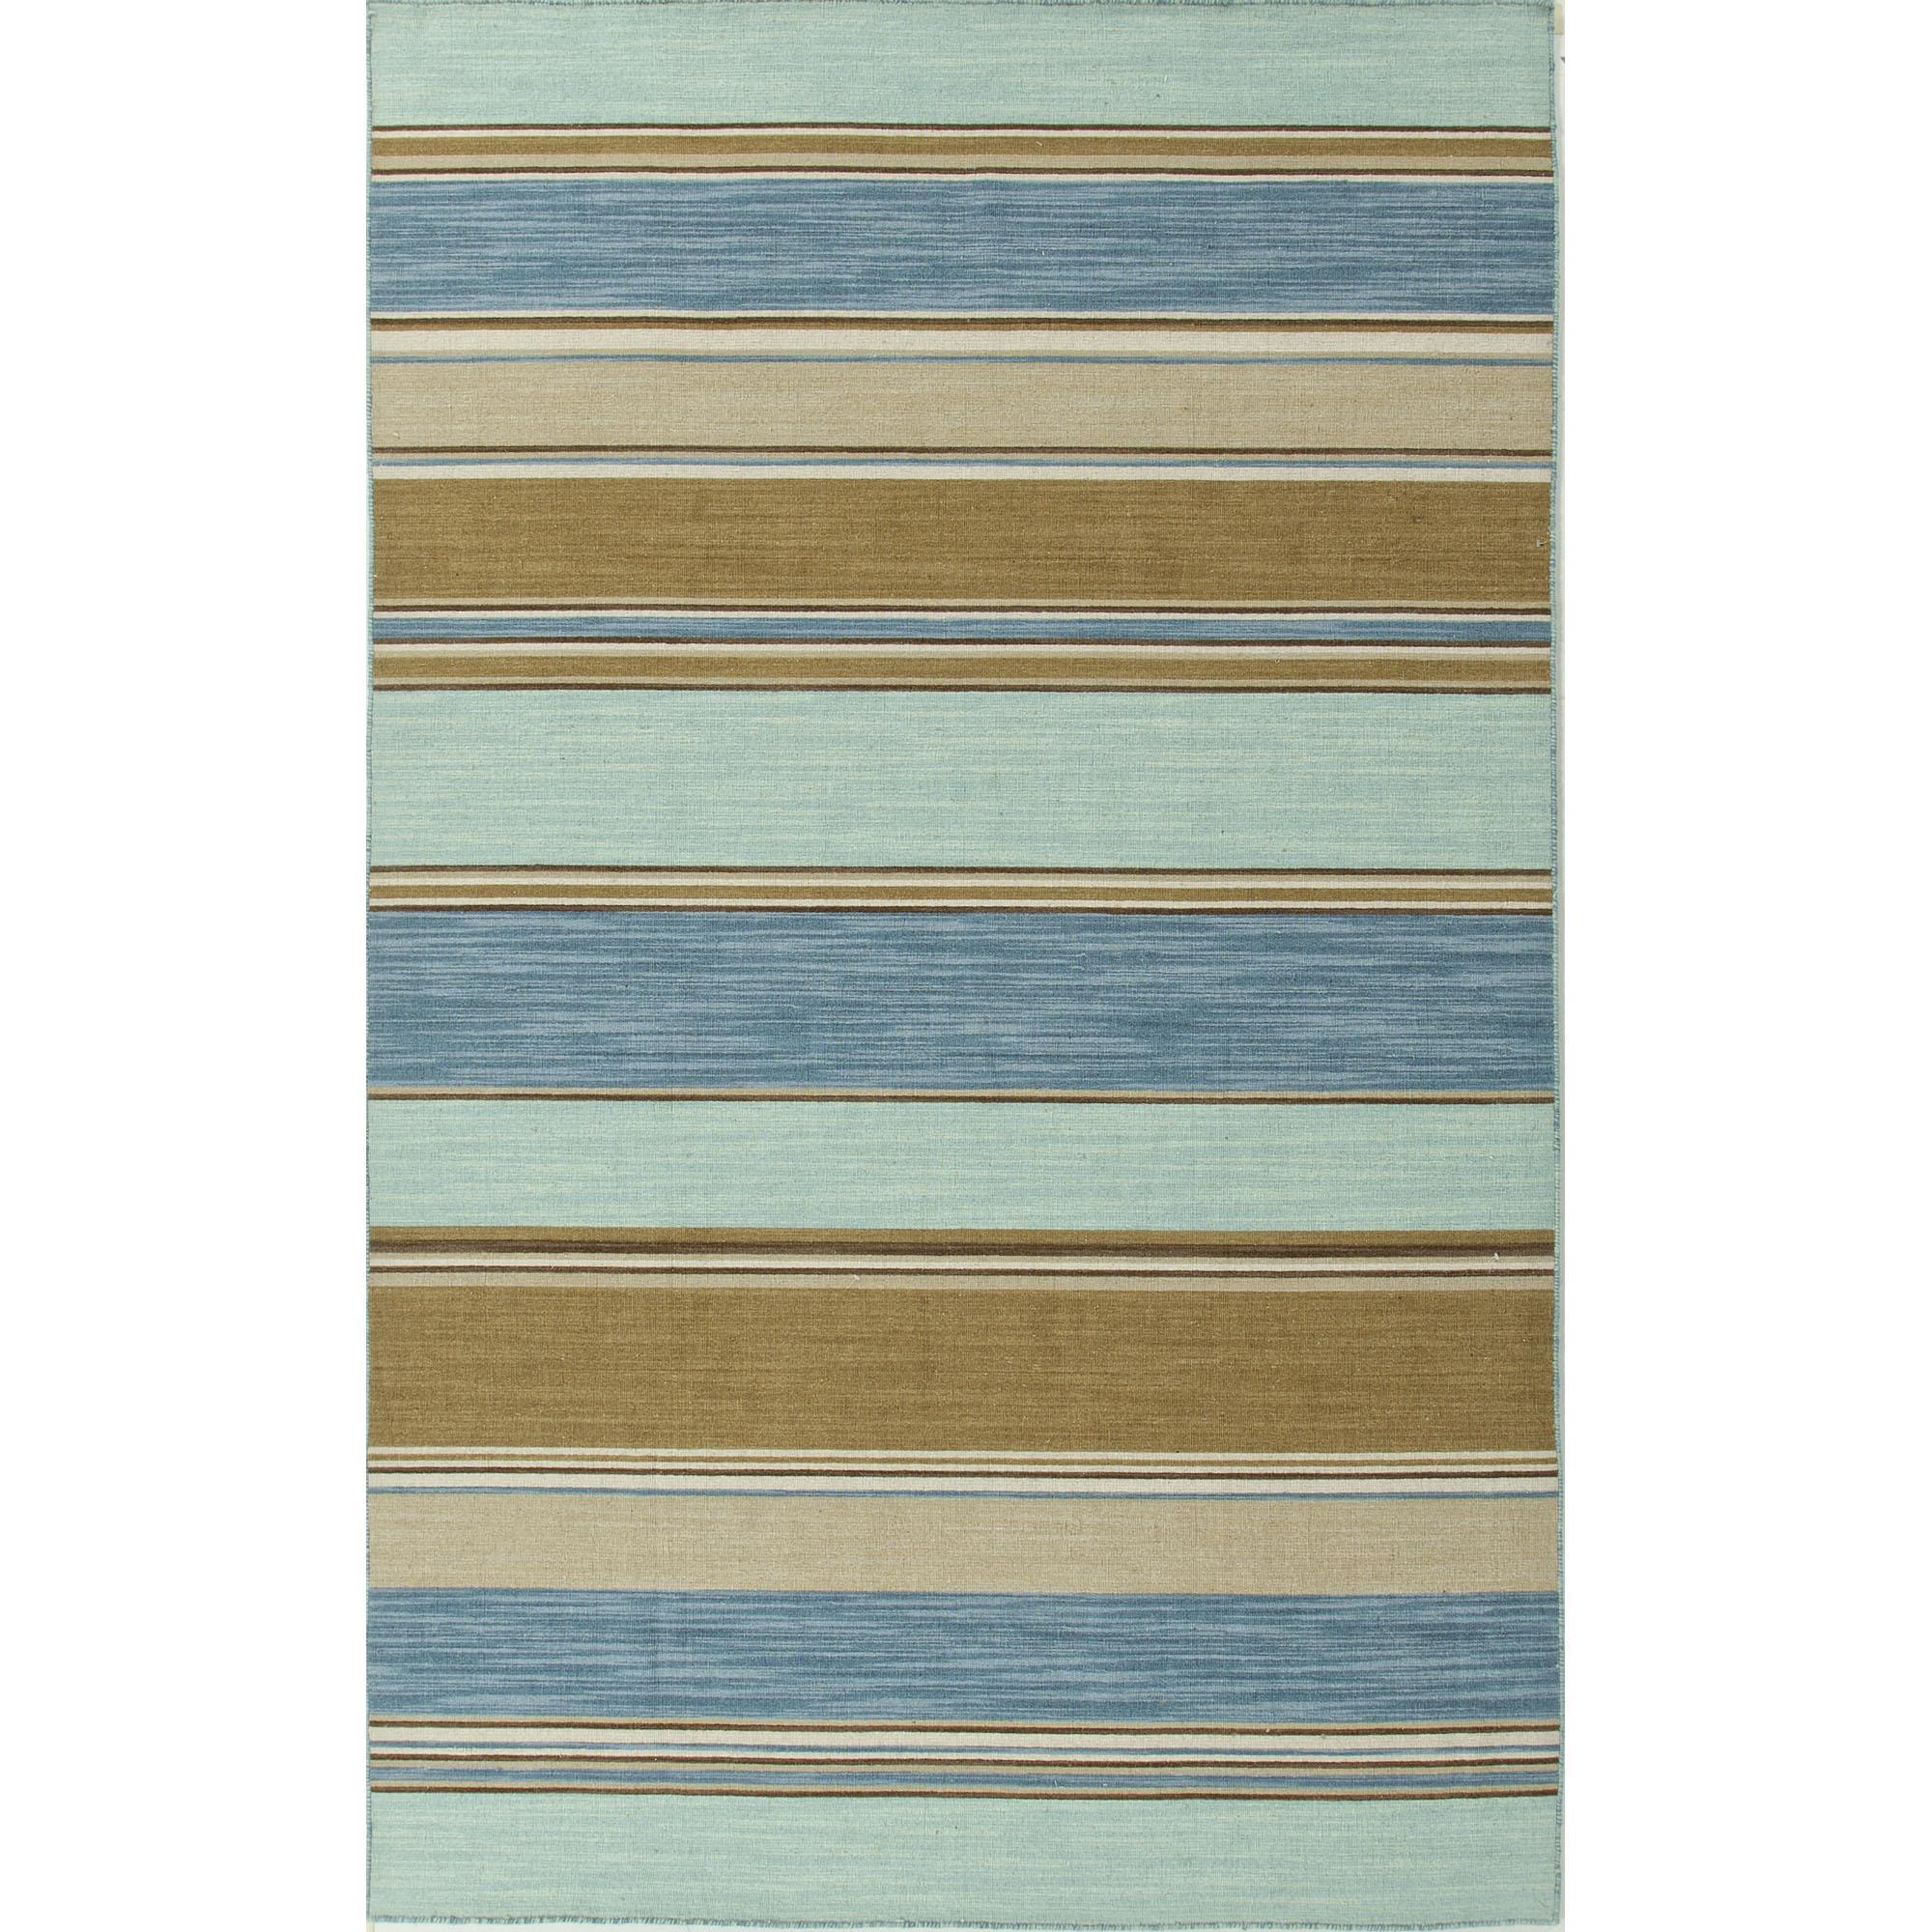 JAIPUR Rugs Coastal Shores 4 x 6 Rug - Item Number: RUG122432